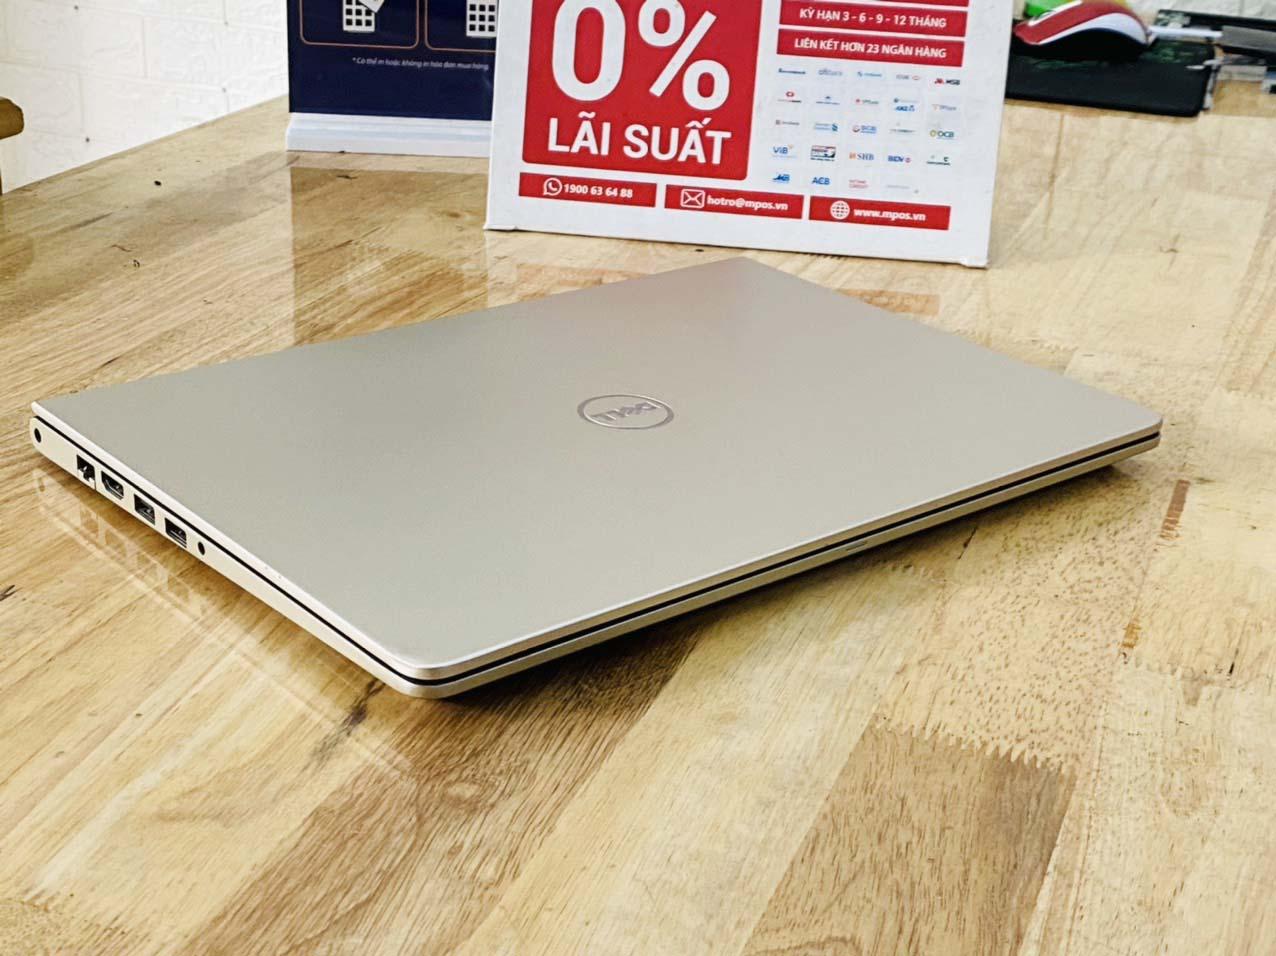 Laptop Dell Vostro 5468 i5-7200U